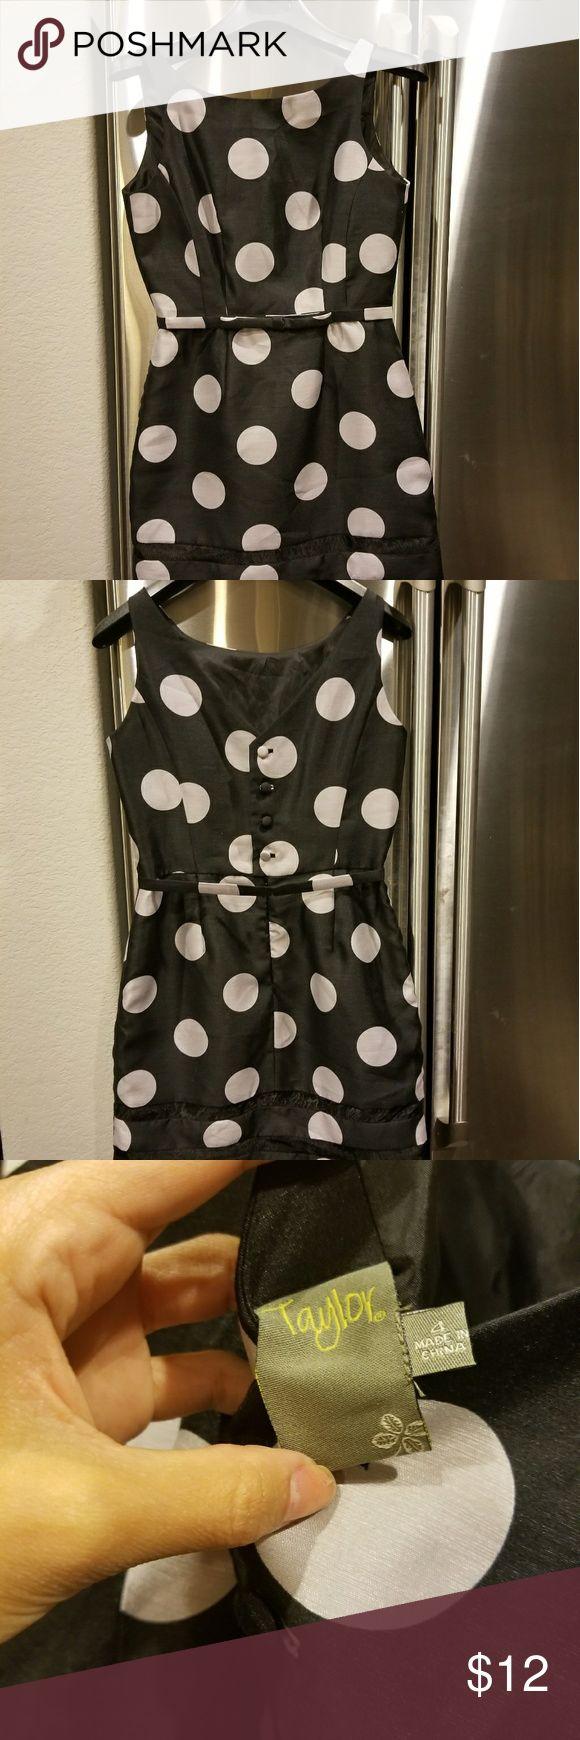 Super cute cocktail dress Polka dot, cute fit Dresses Mini